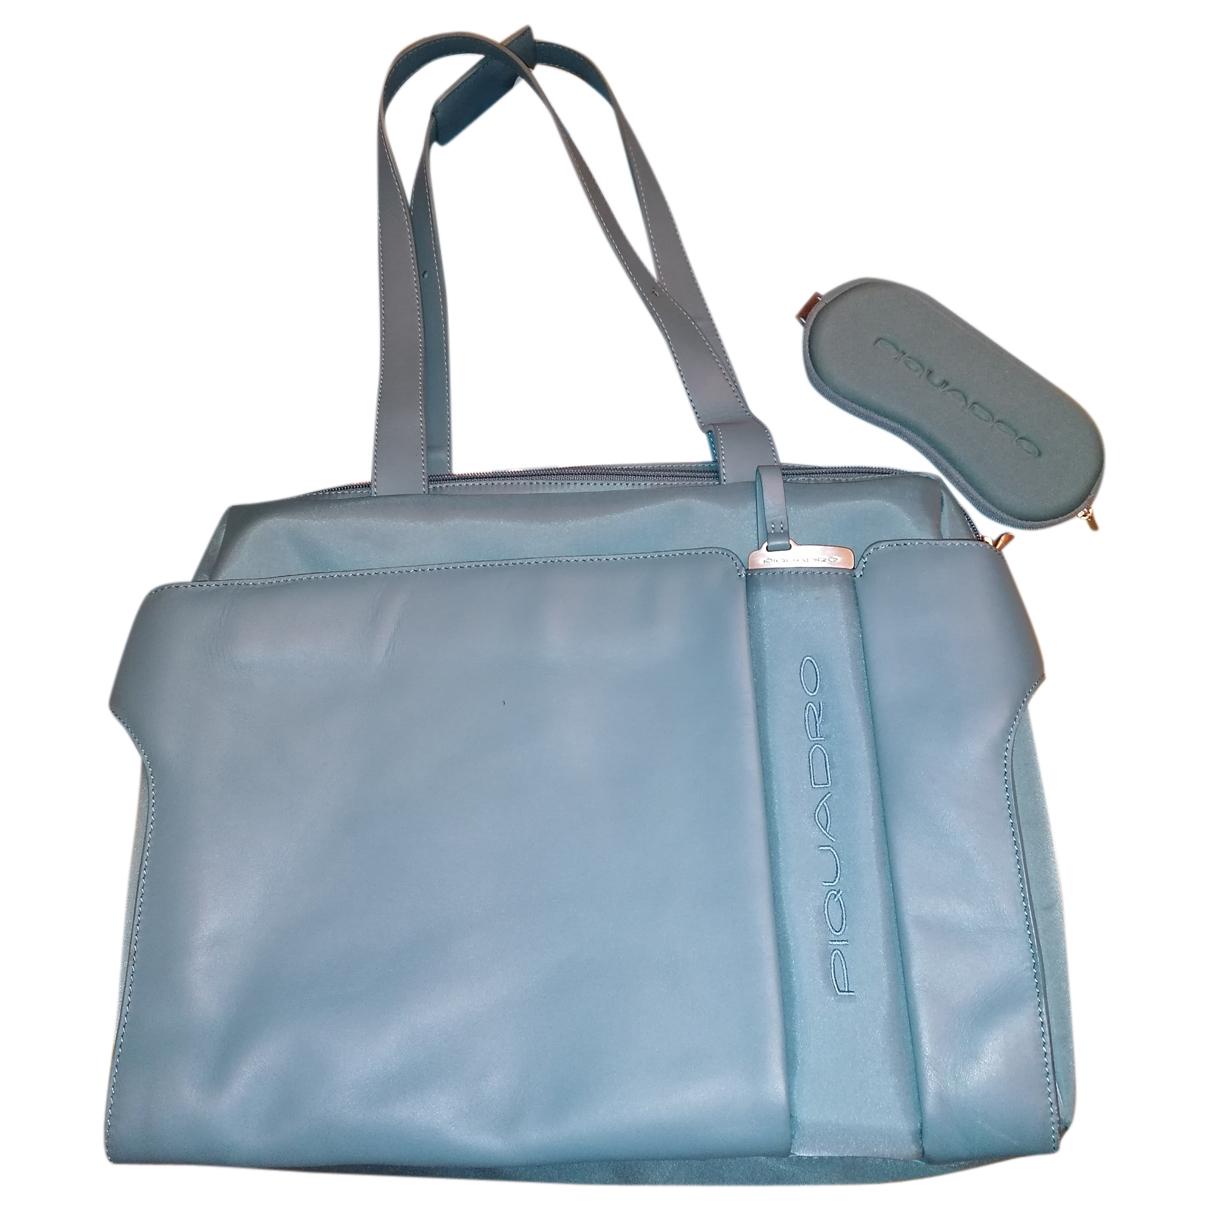 Piquadro - Sac a main   pour femme - turquoise